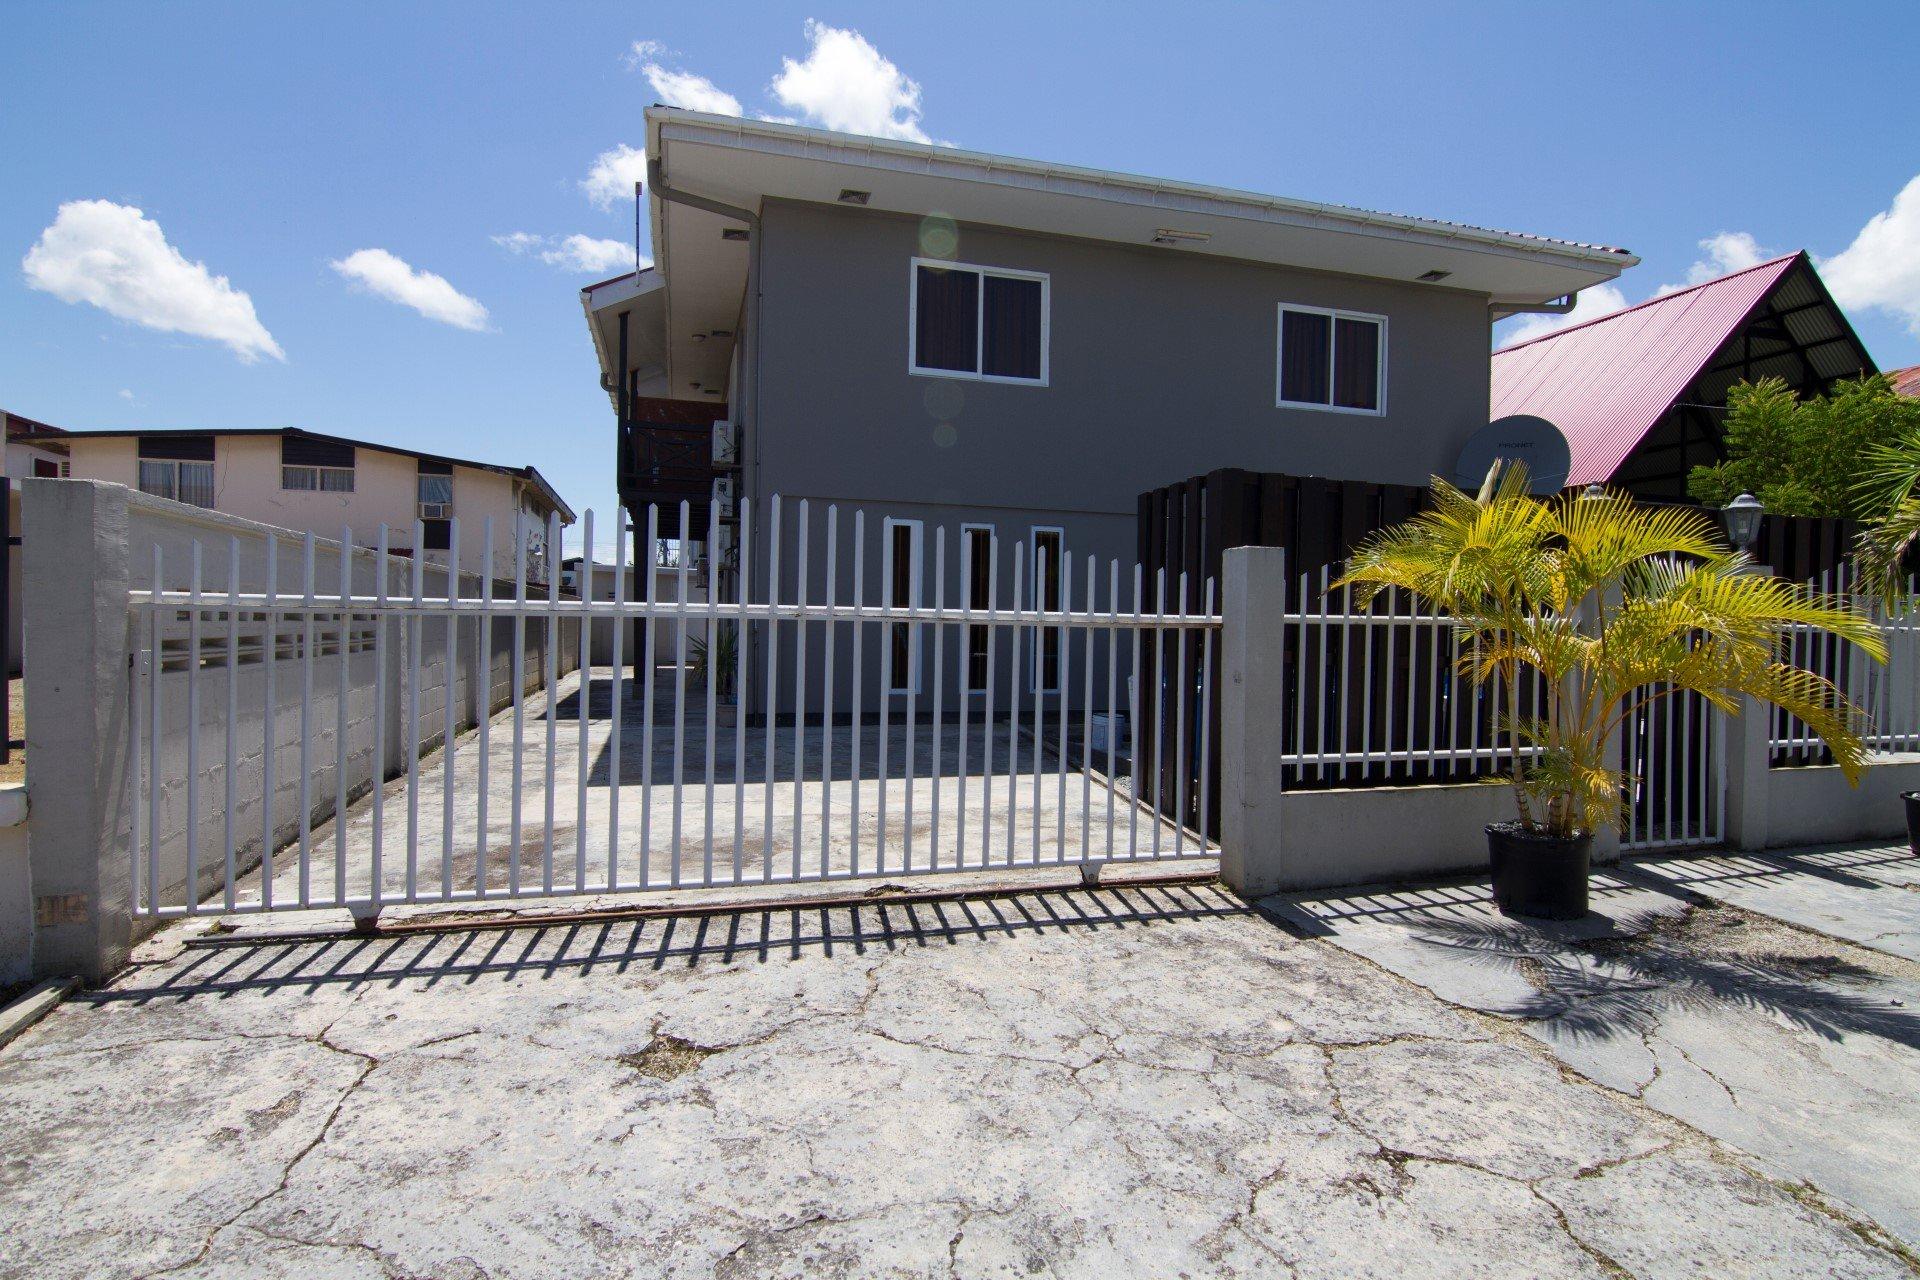 Poseidonstraat 10 - Paramaribo - Noord - Surgoed Makelaardij NV - Paramaribo, Suriname